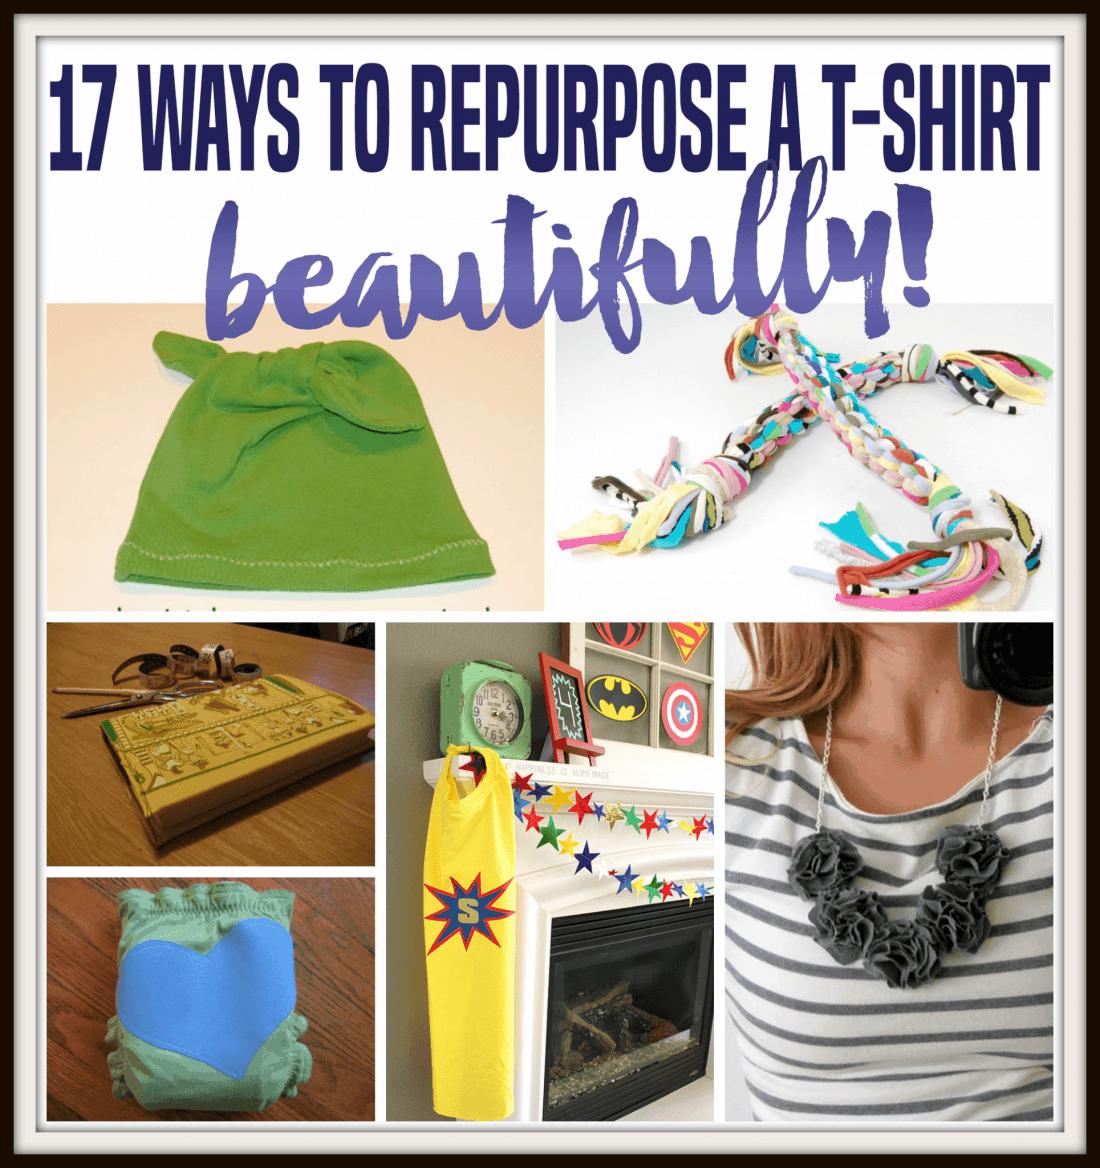 17 Ways To Repurpose A T-shirt